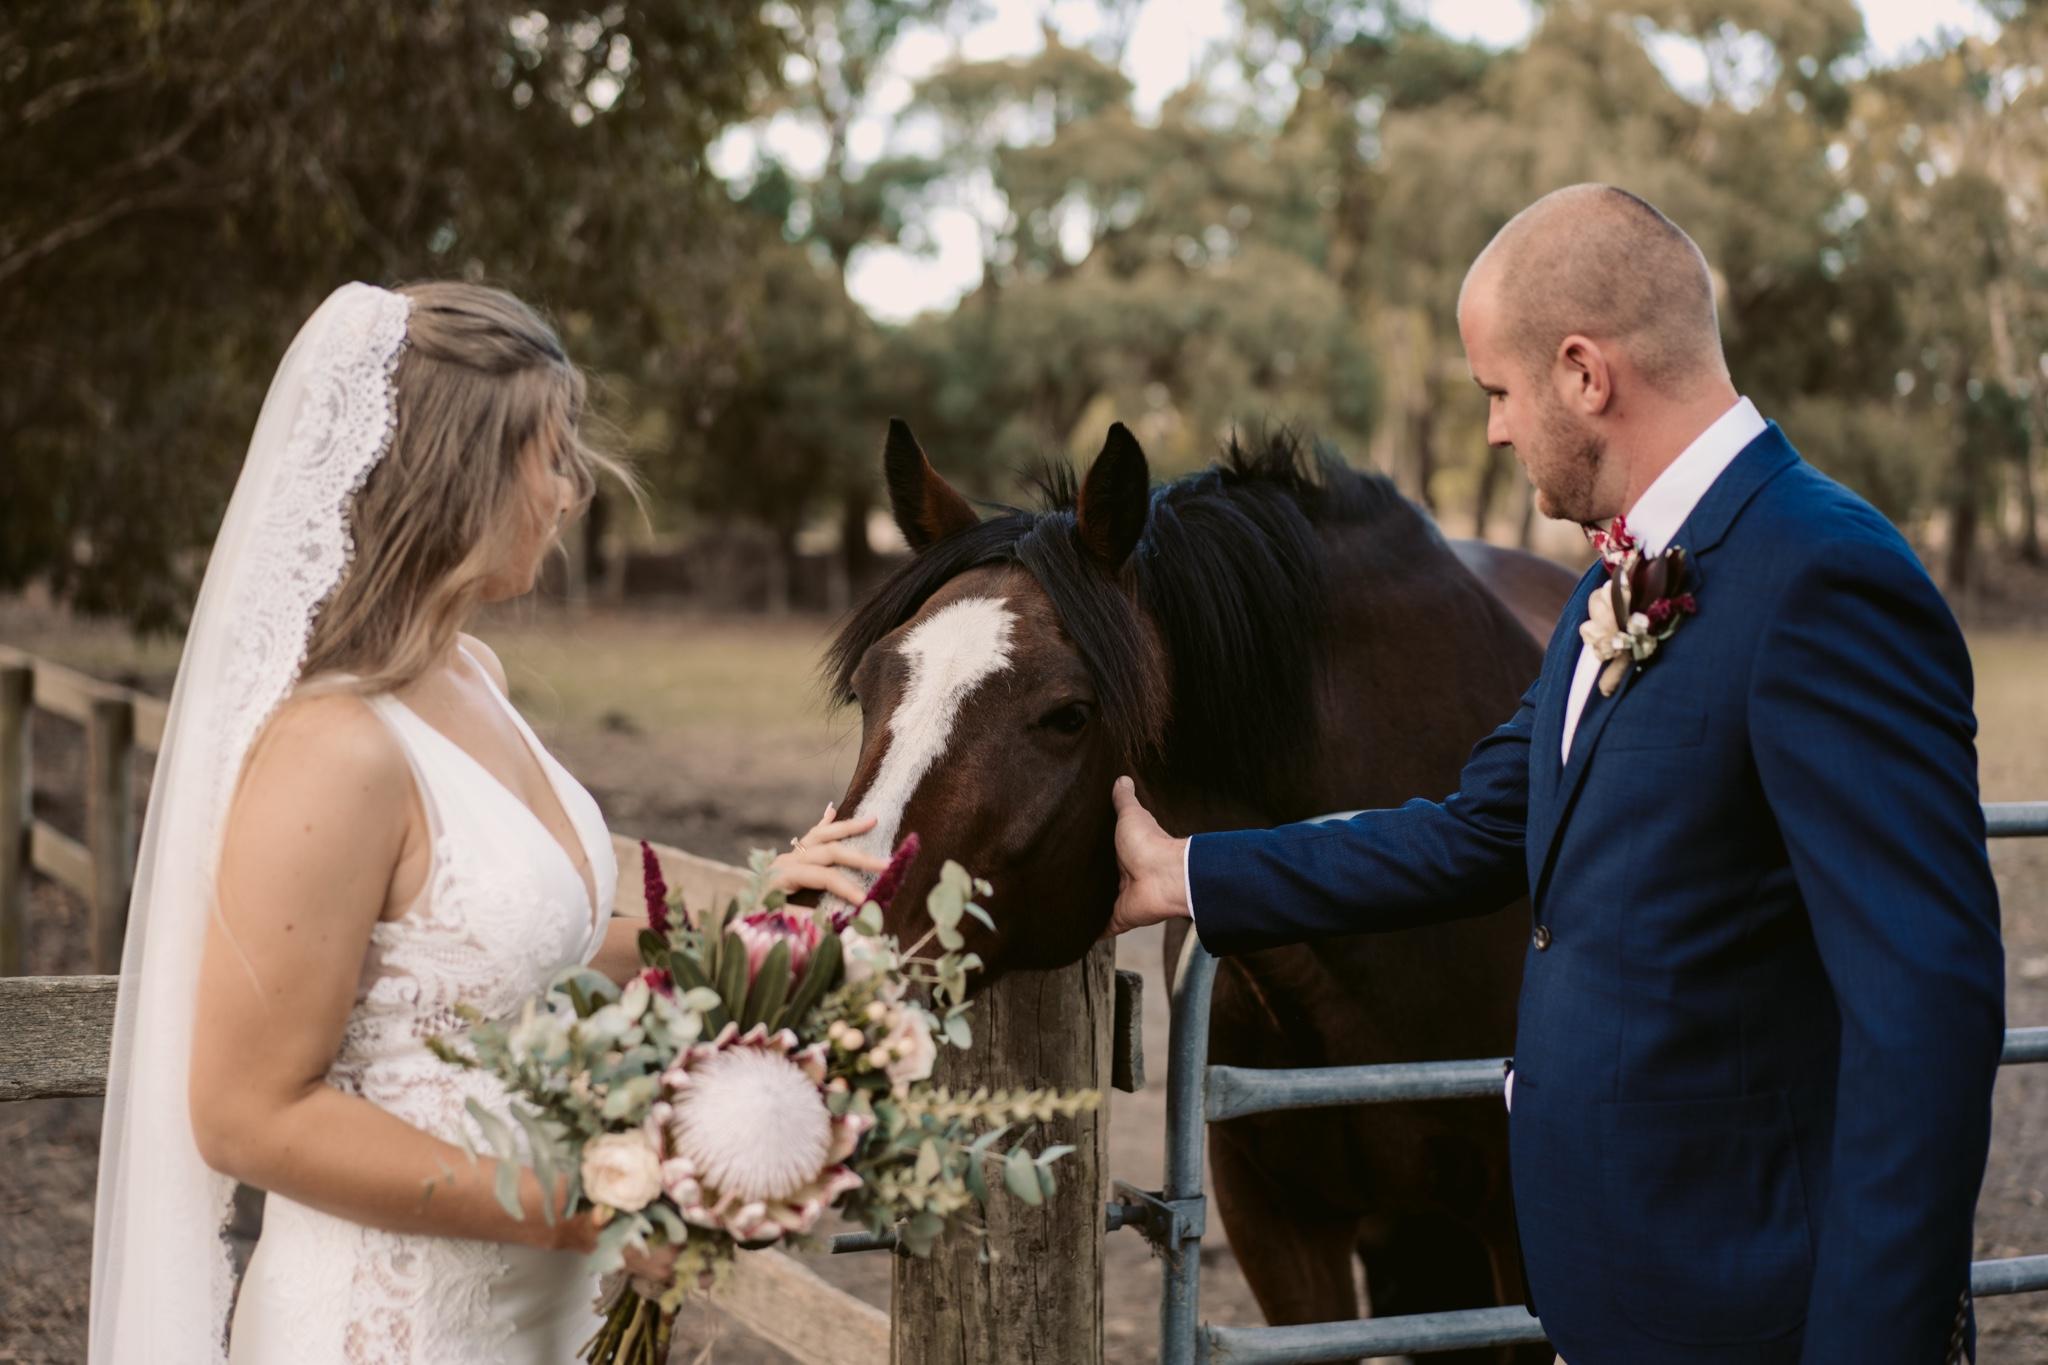 Mornington Peninsula Wedding Photography61.jpg